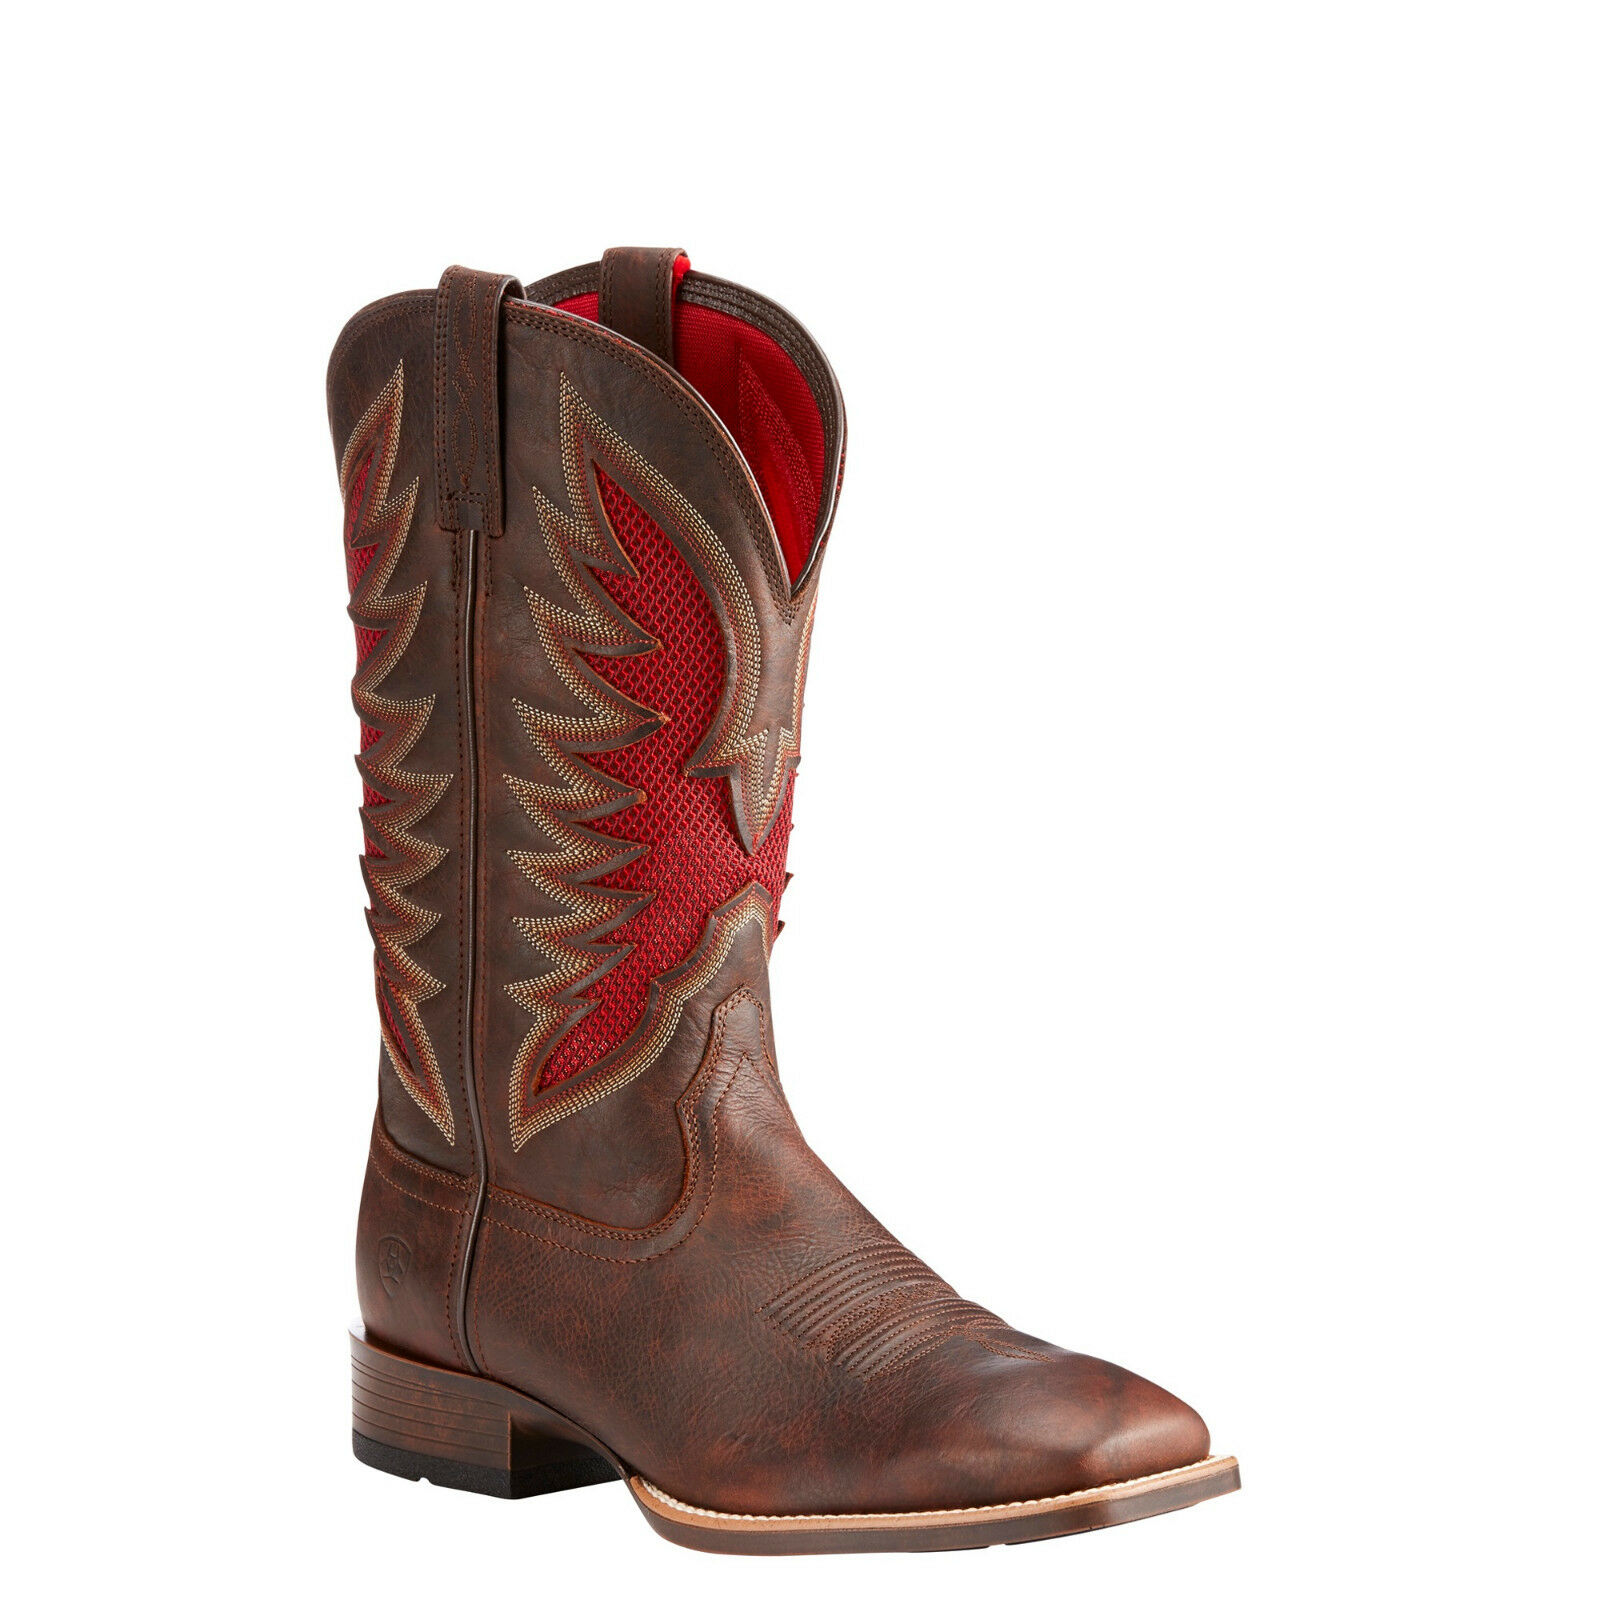 Ariat® Men's Venttek™ Ultra Barley Brown Red Square Toe Boots 10023174